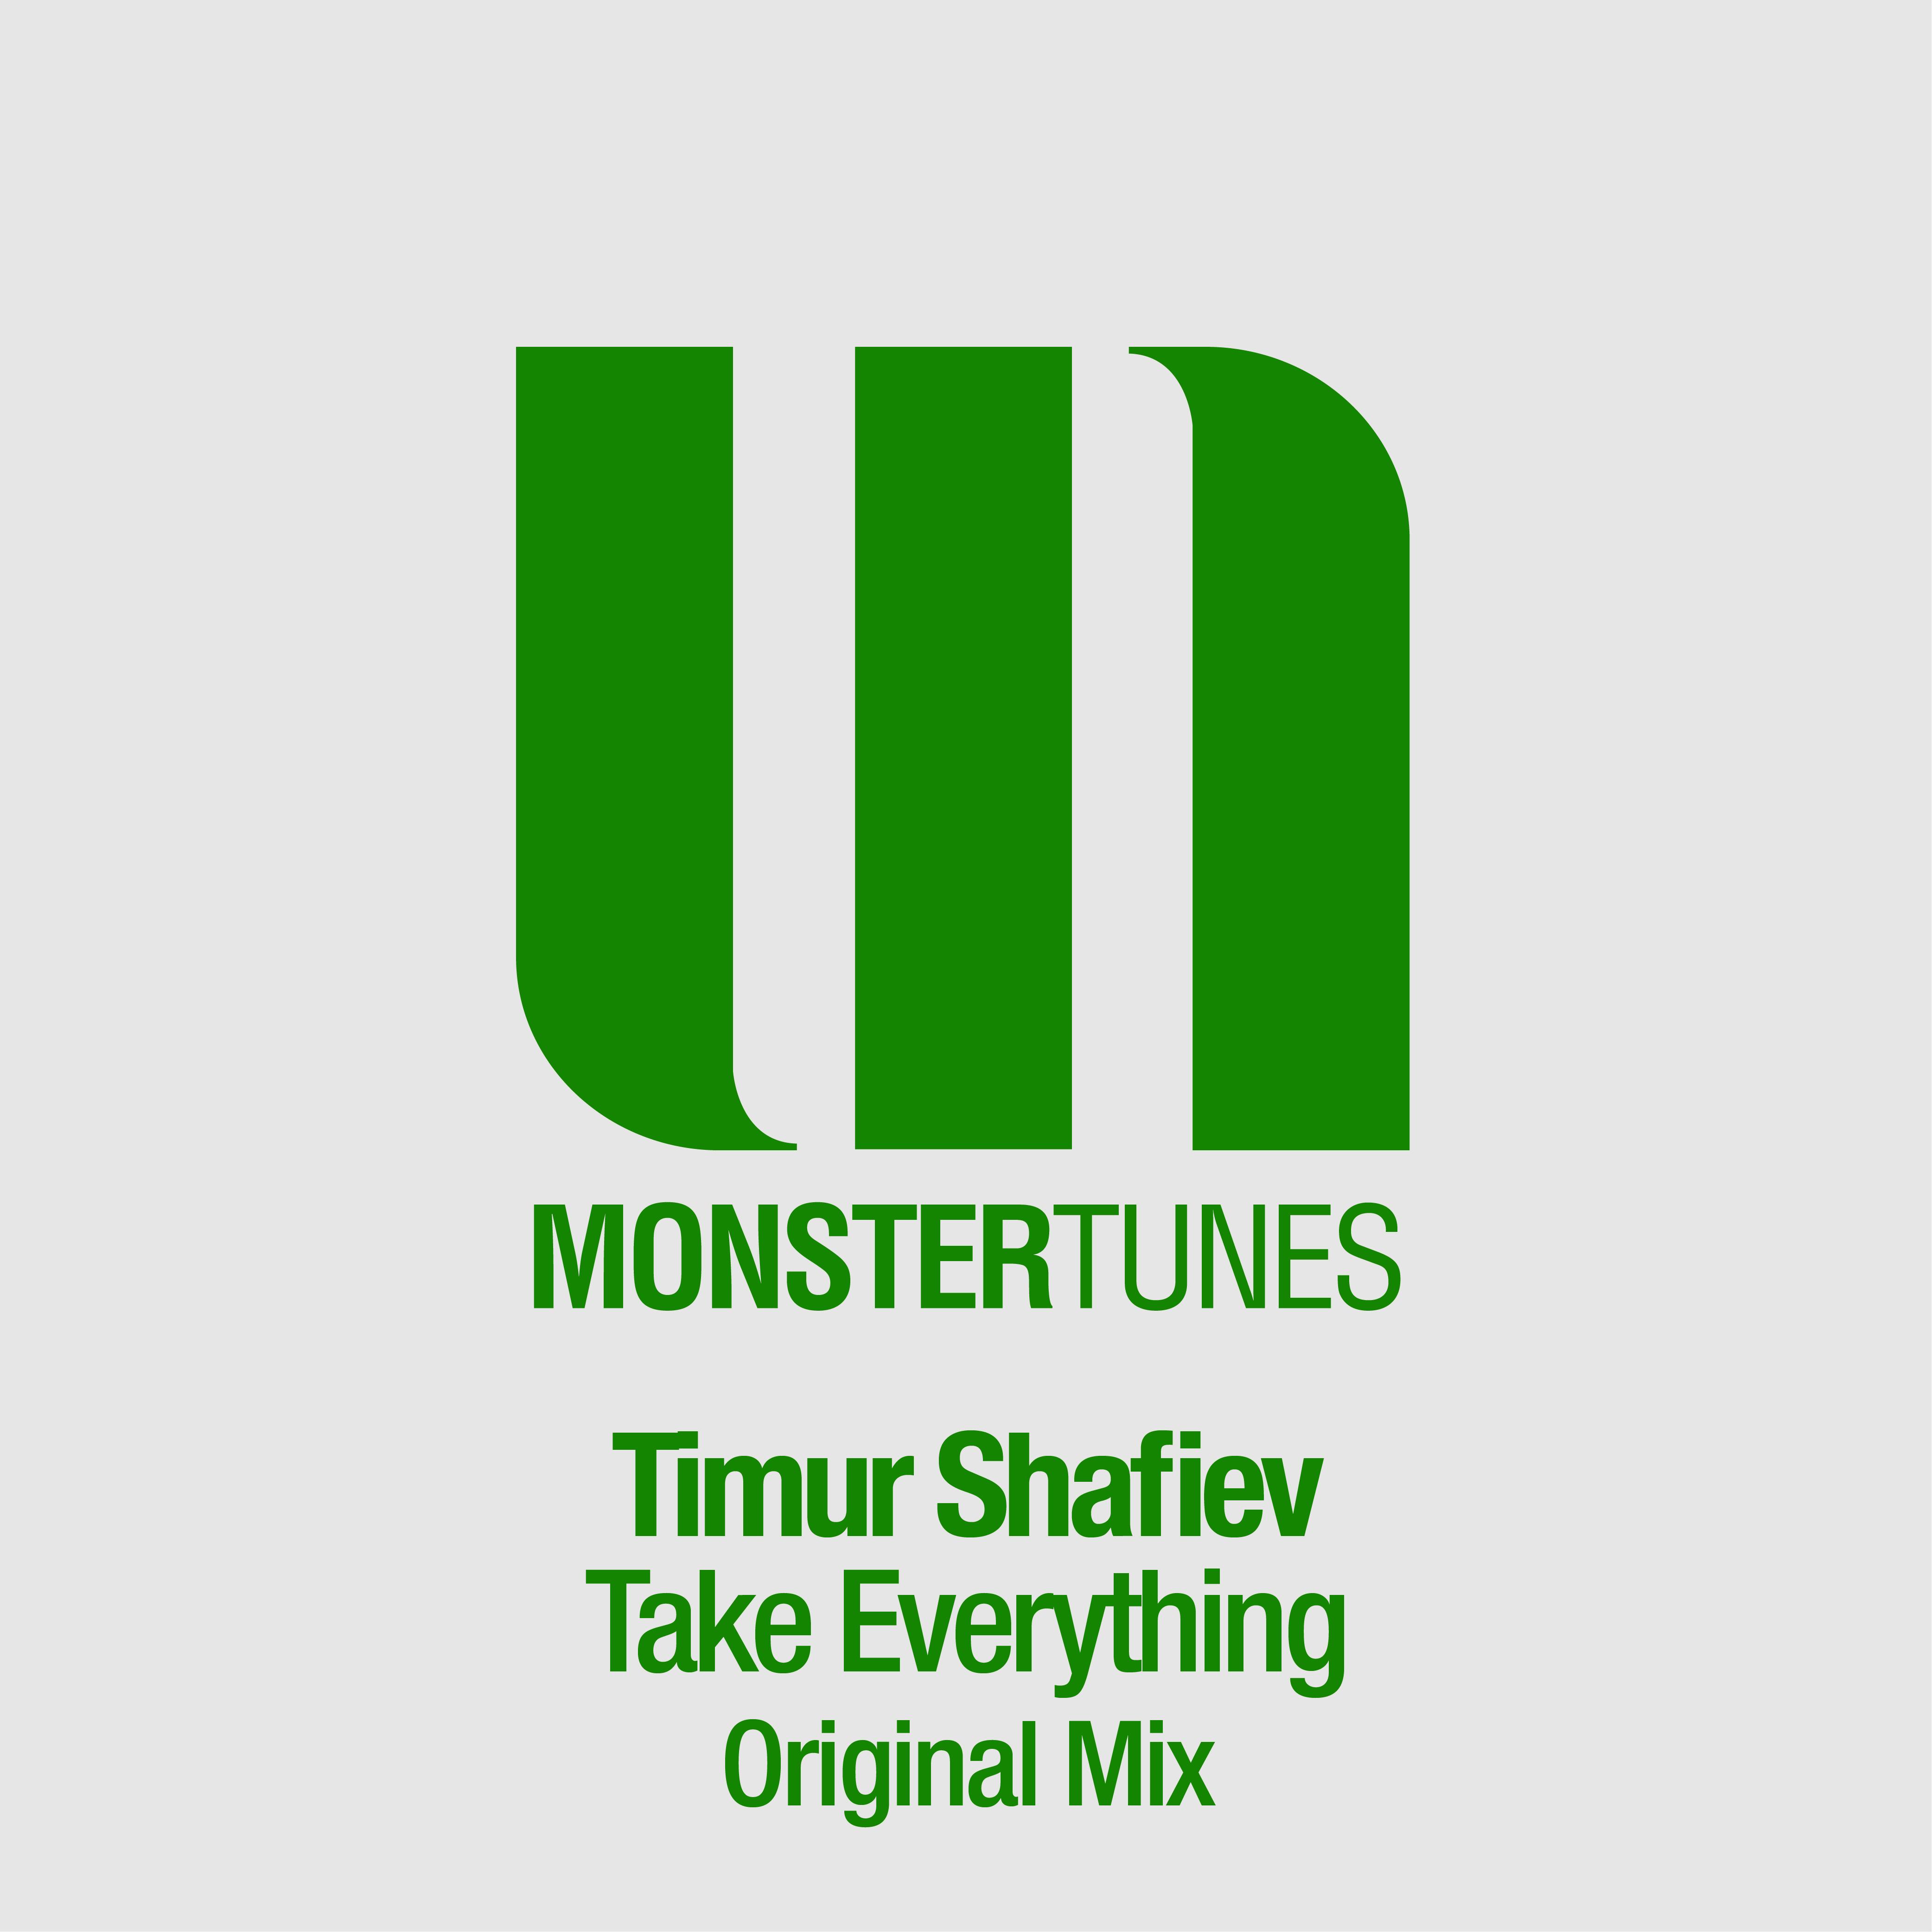 timur-shafiev-take-everything-original-mix-monster-tunes-youredm